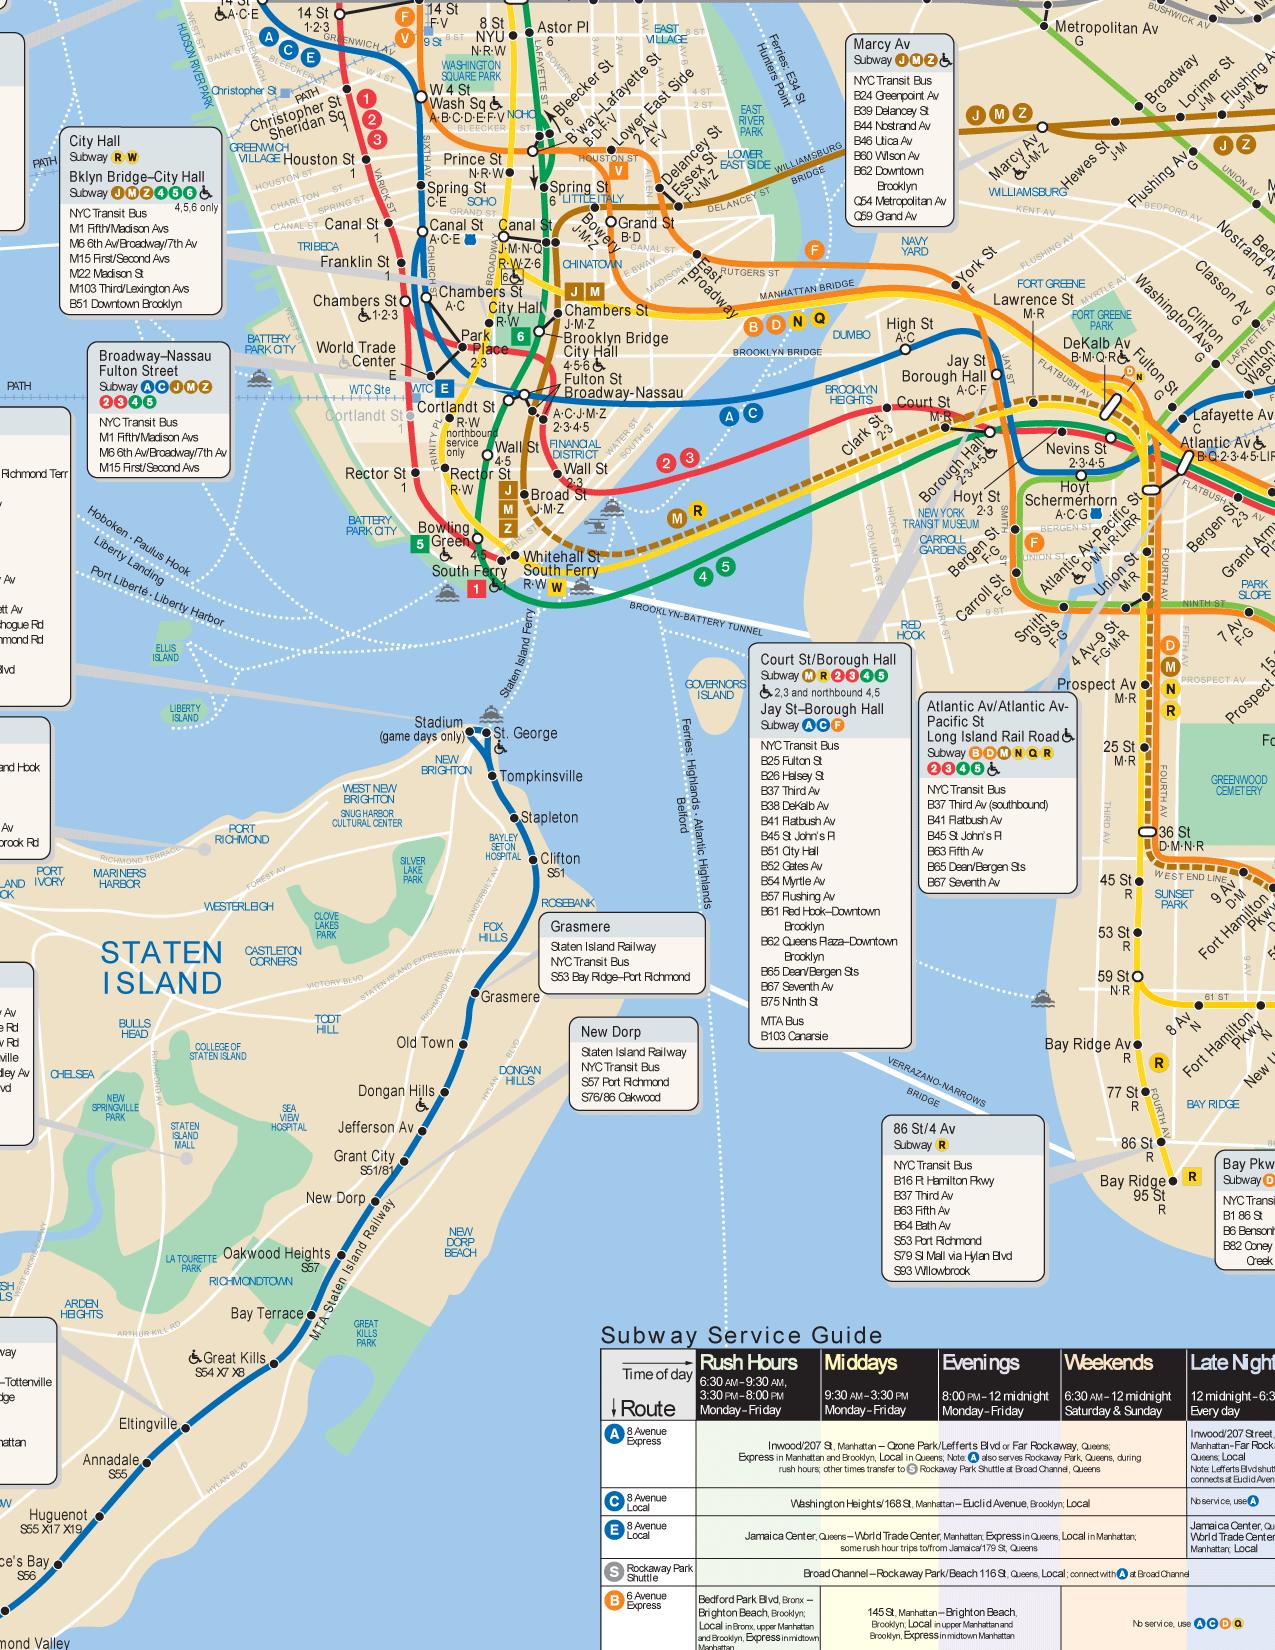 New York Subway Map Streets.New York City Train Map Nyc Subway Map Iphone App Artwork Pinterest